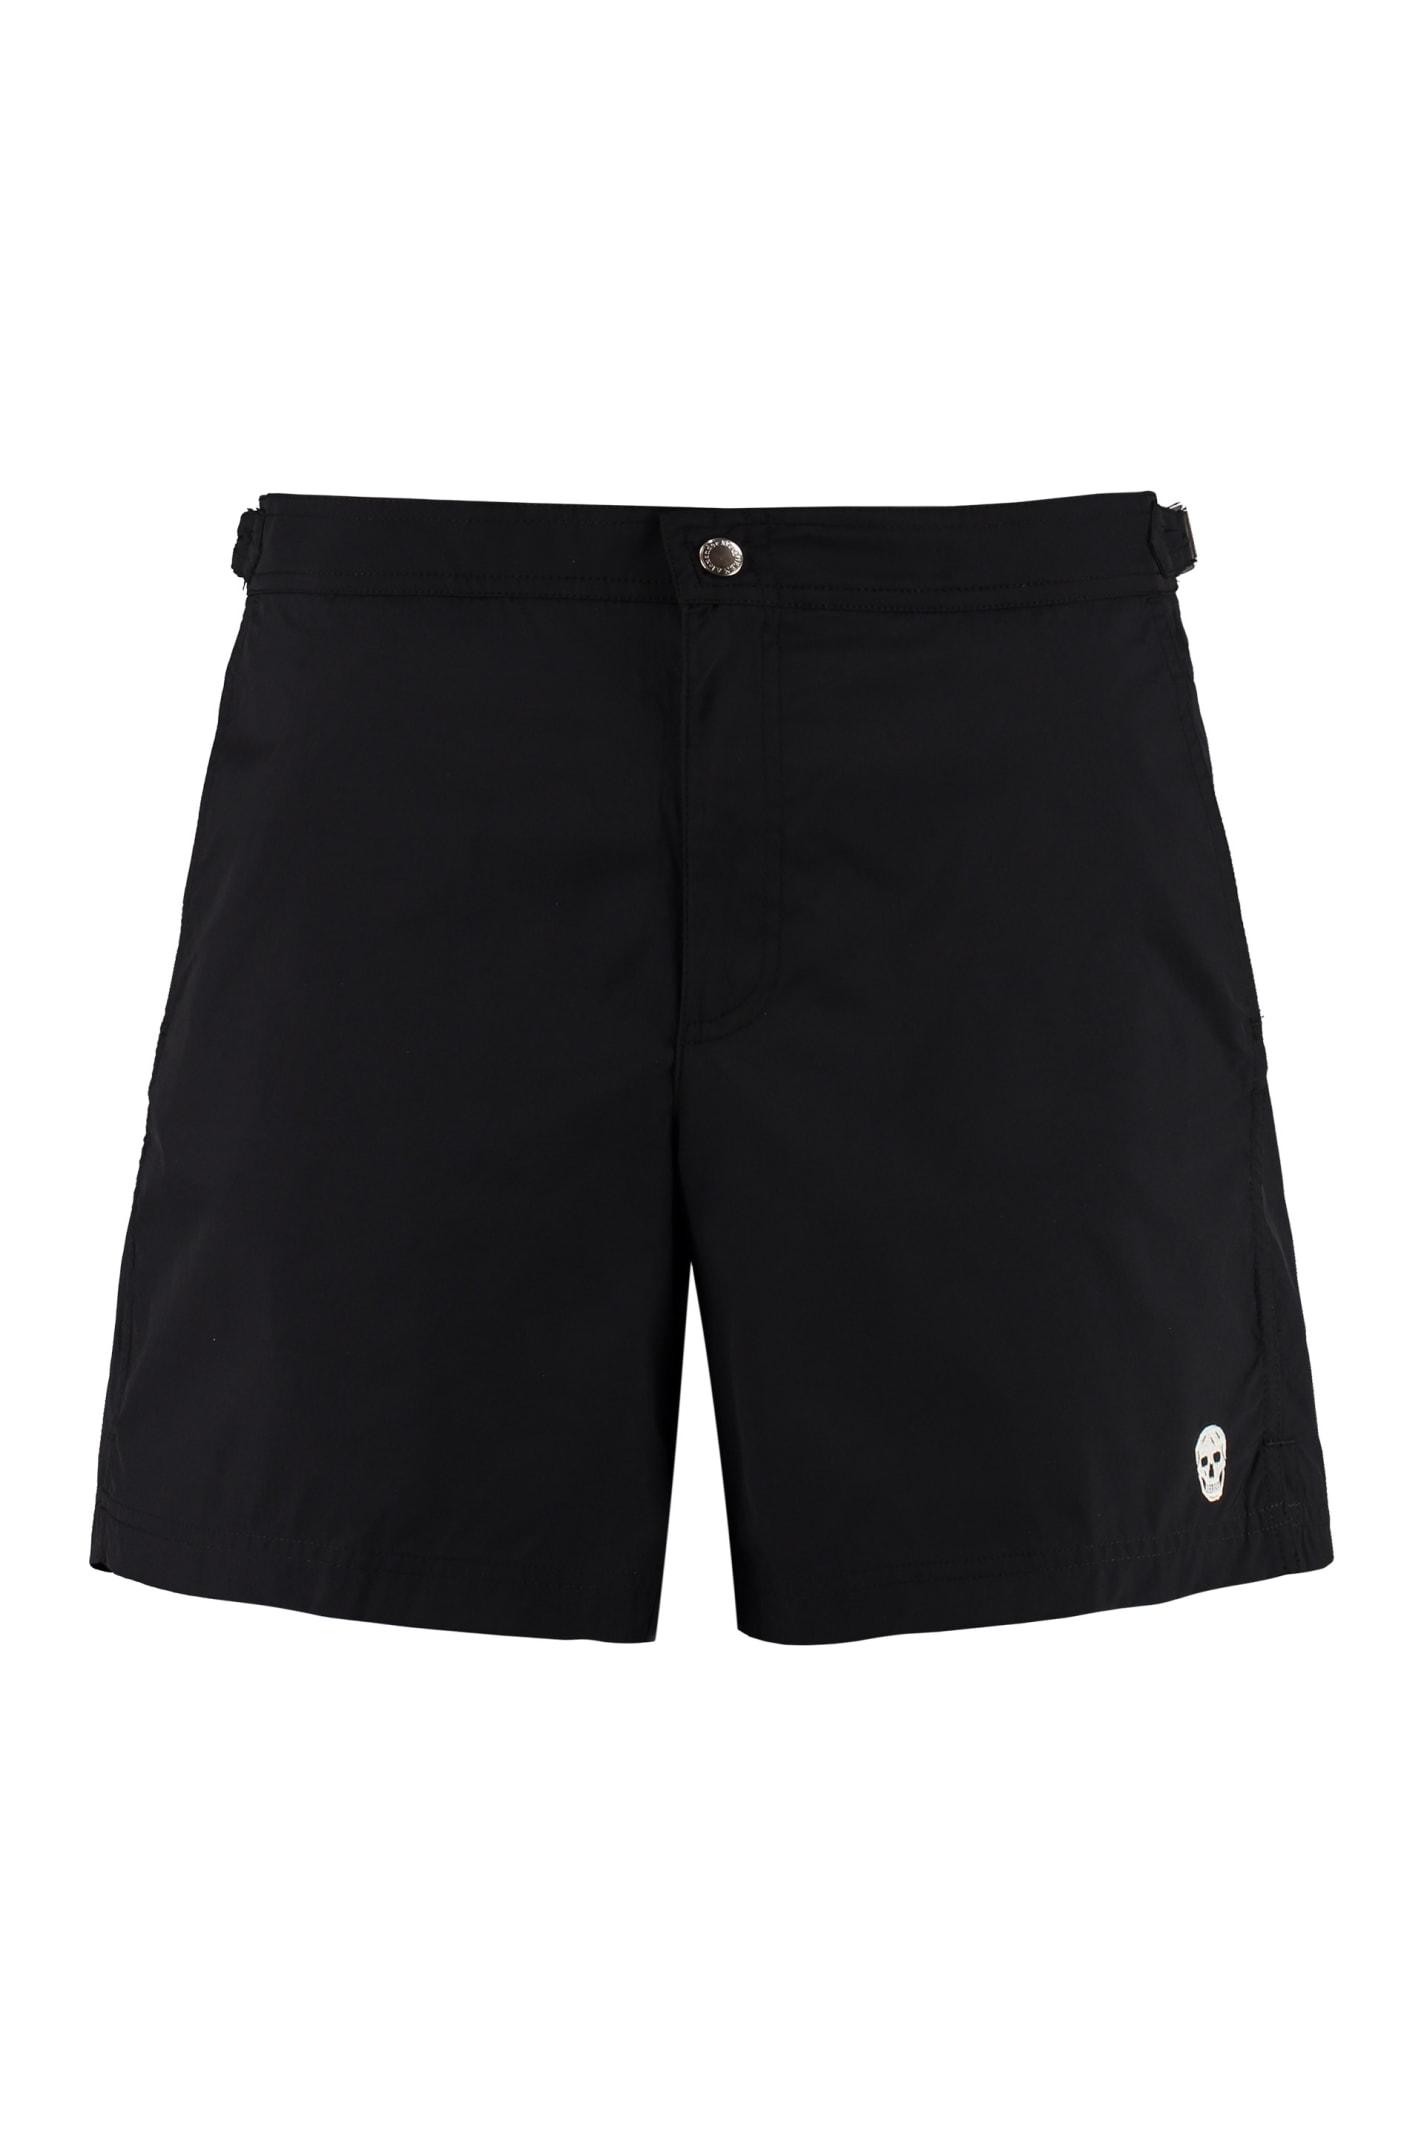 Alexander McQueen Nylon Swim Shorts